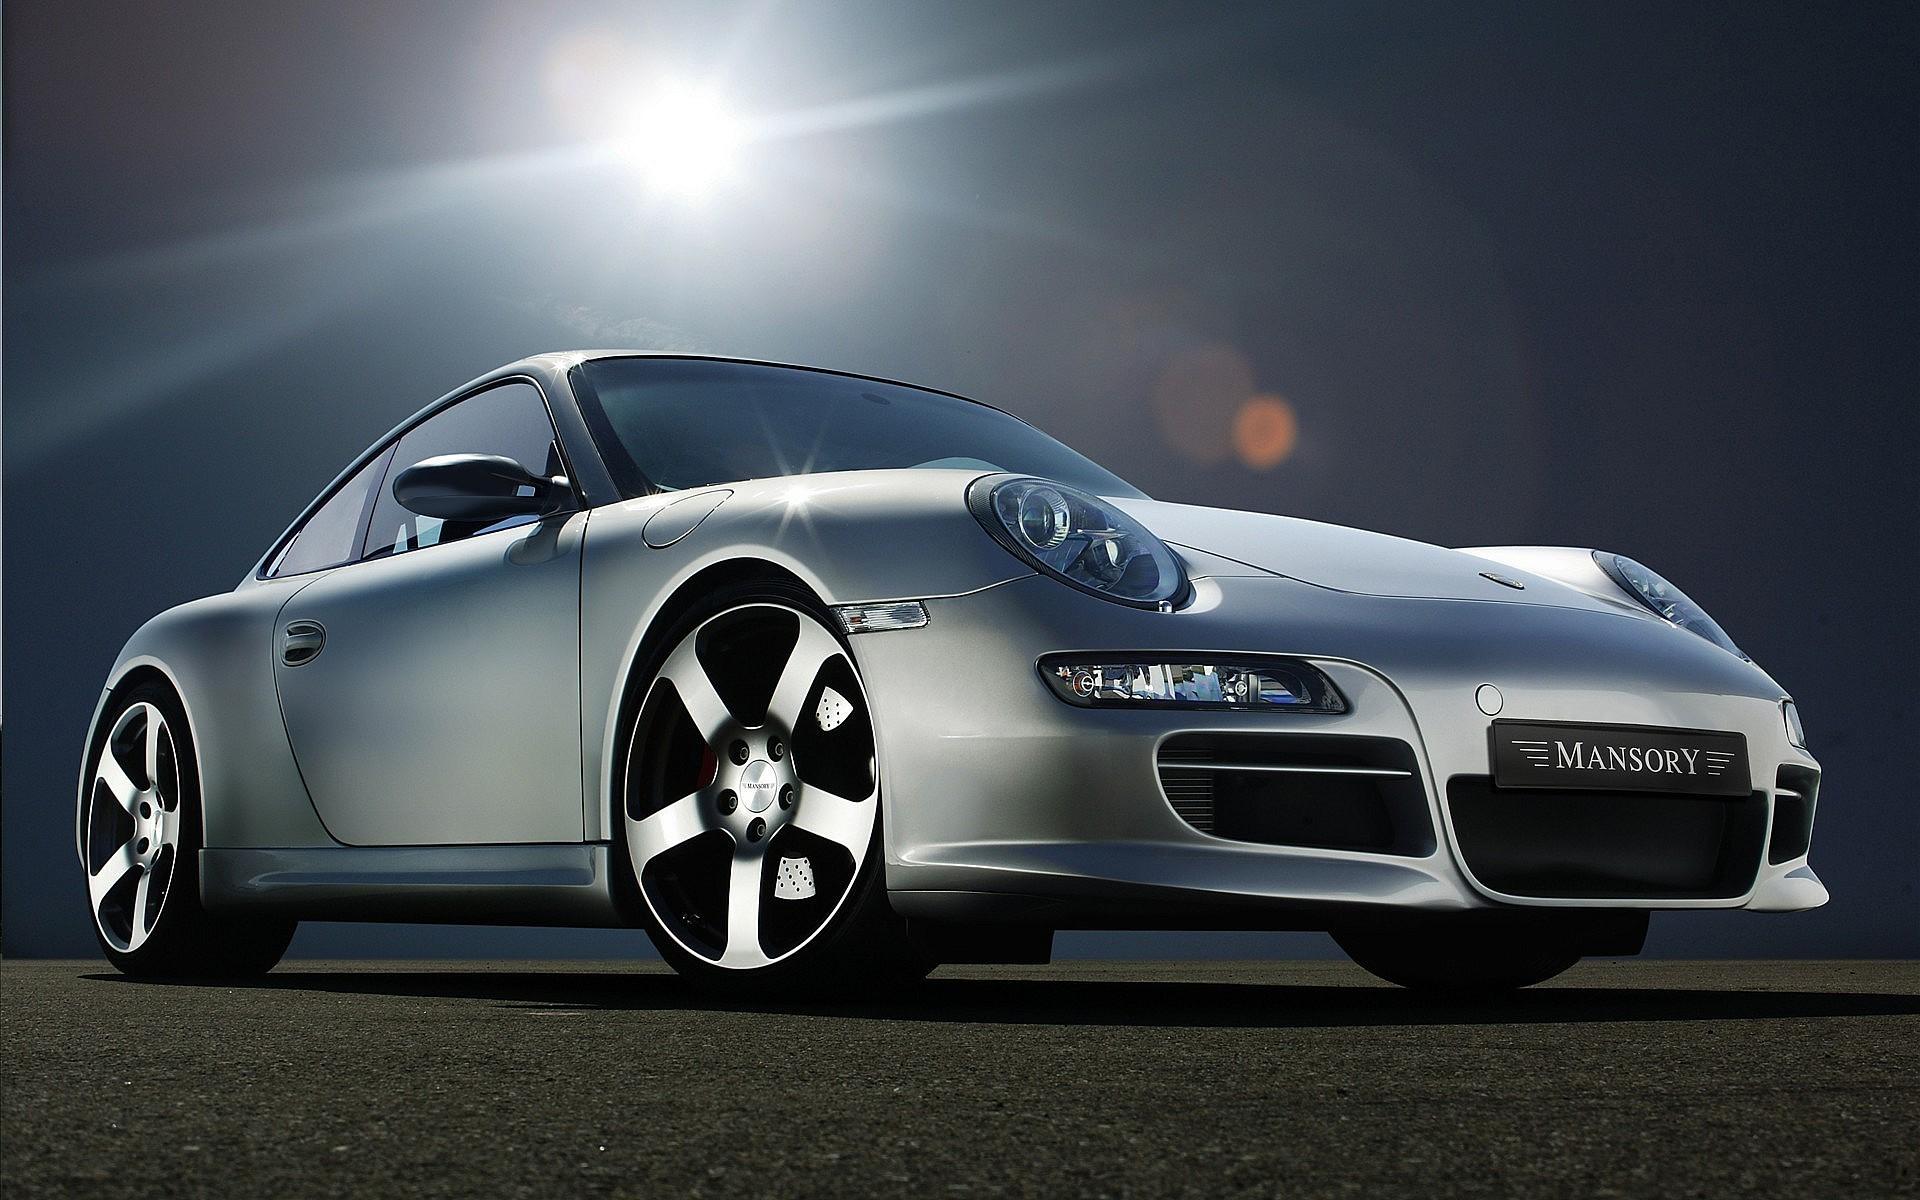 Porsche 911 Wallpaper 83 Images